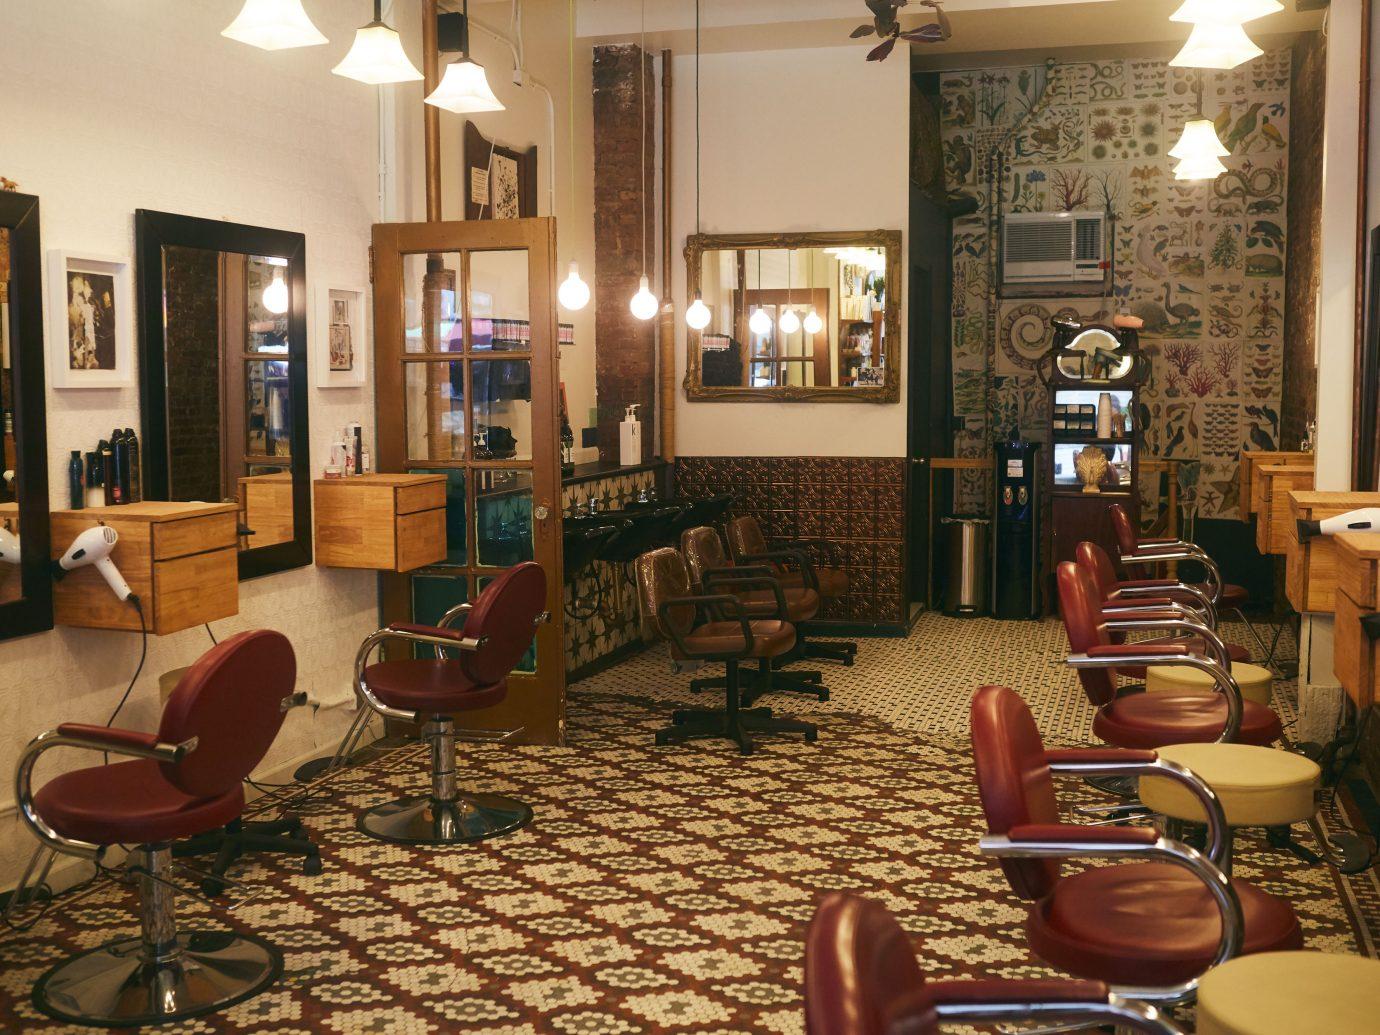 Interior of Fringe salon NYC